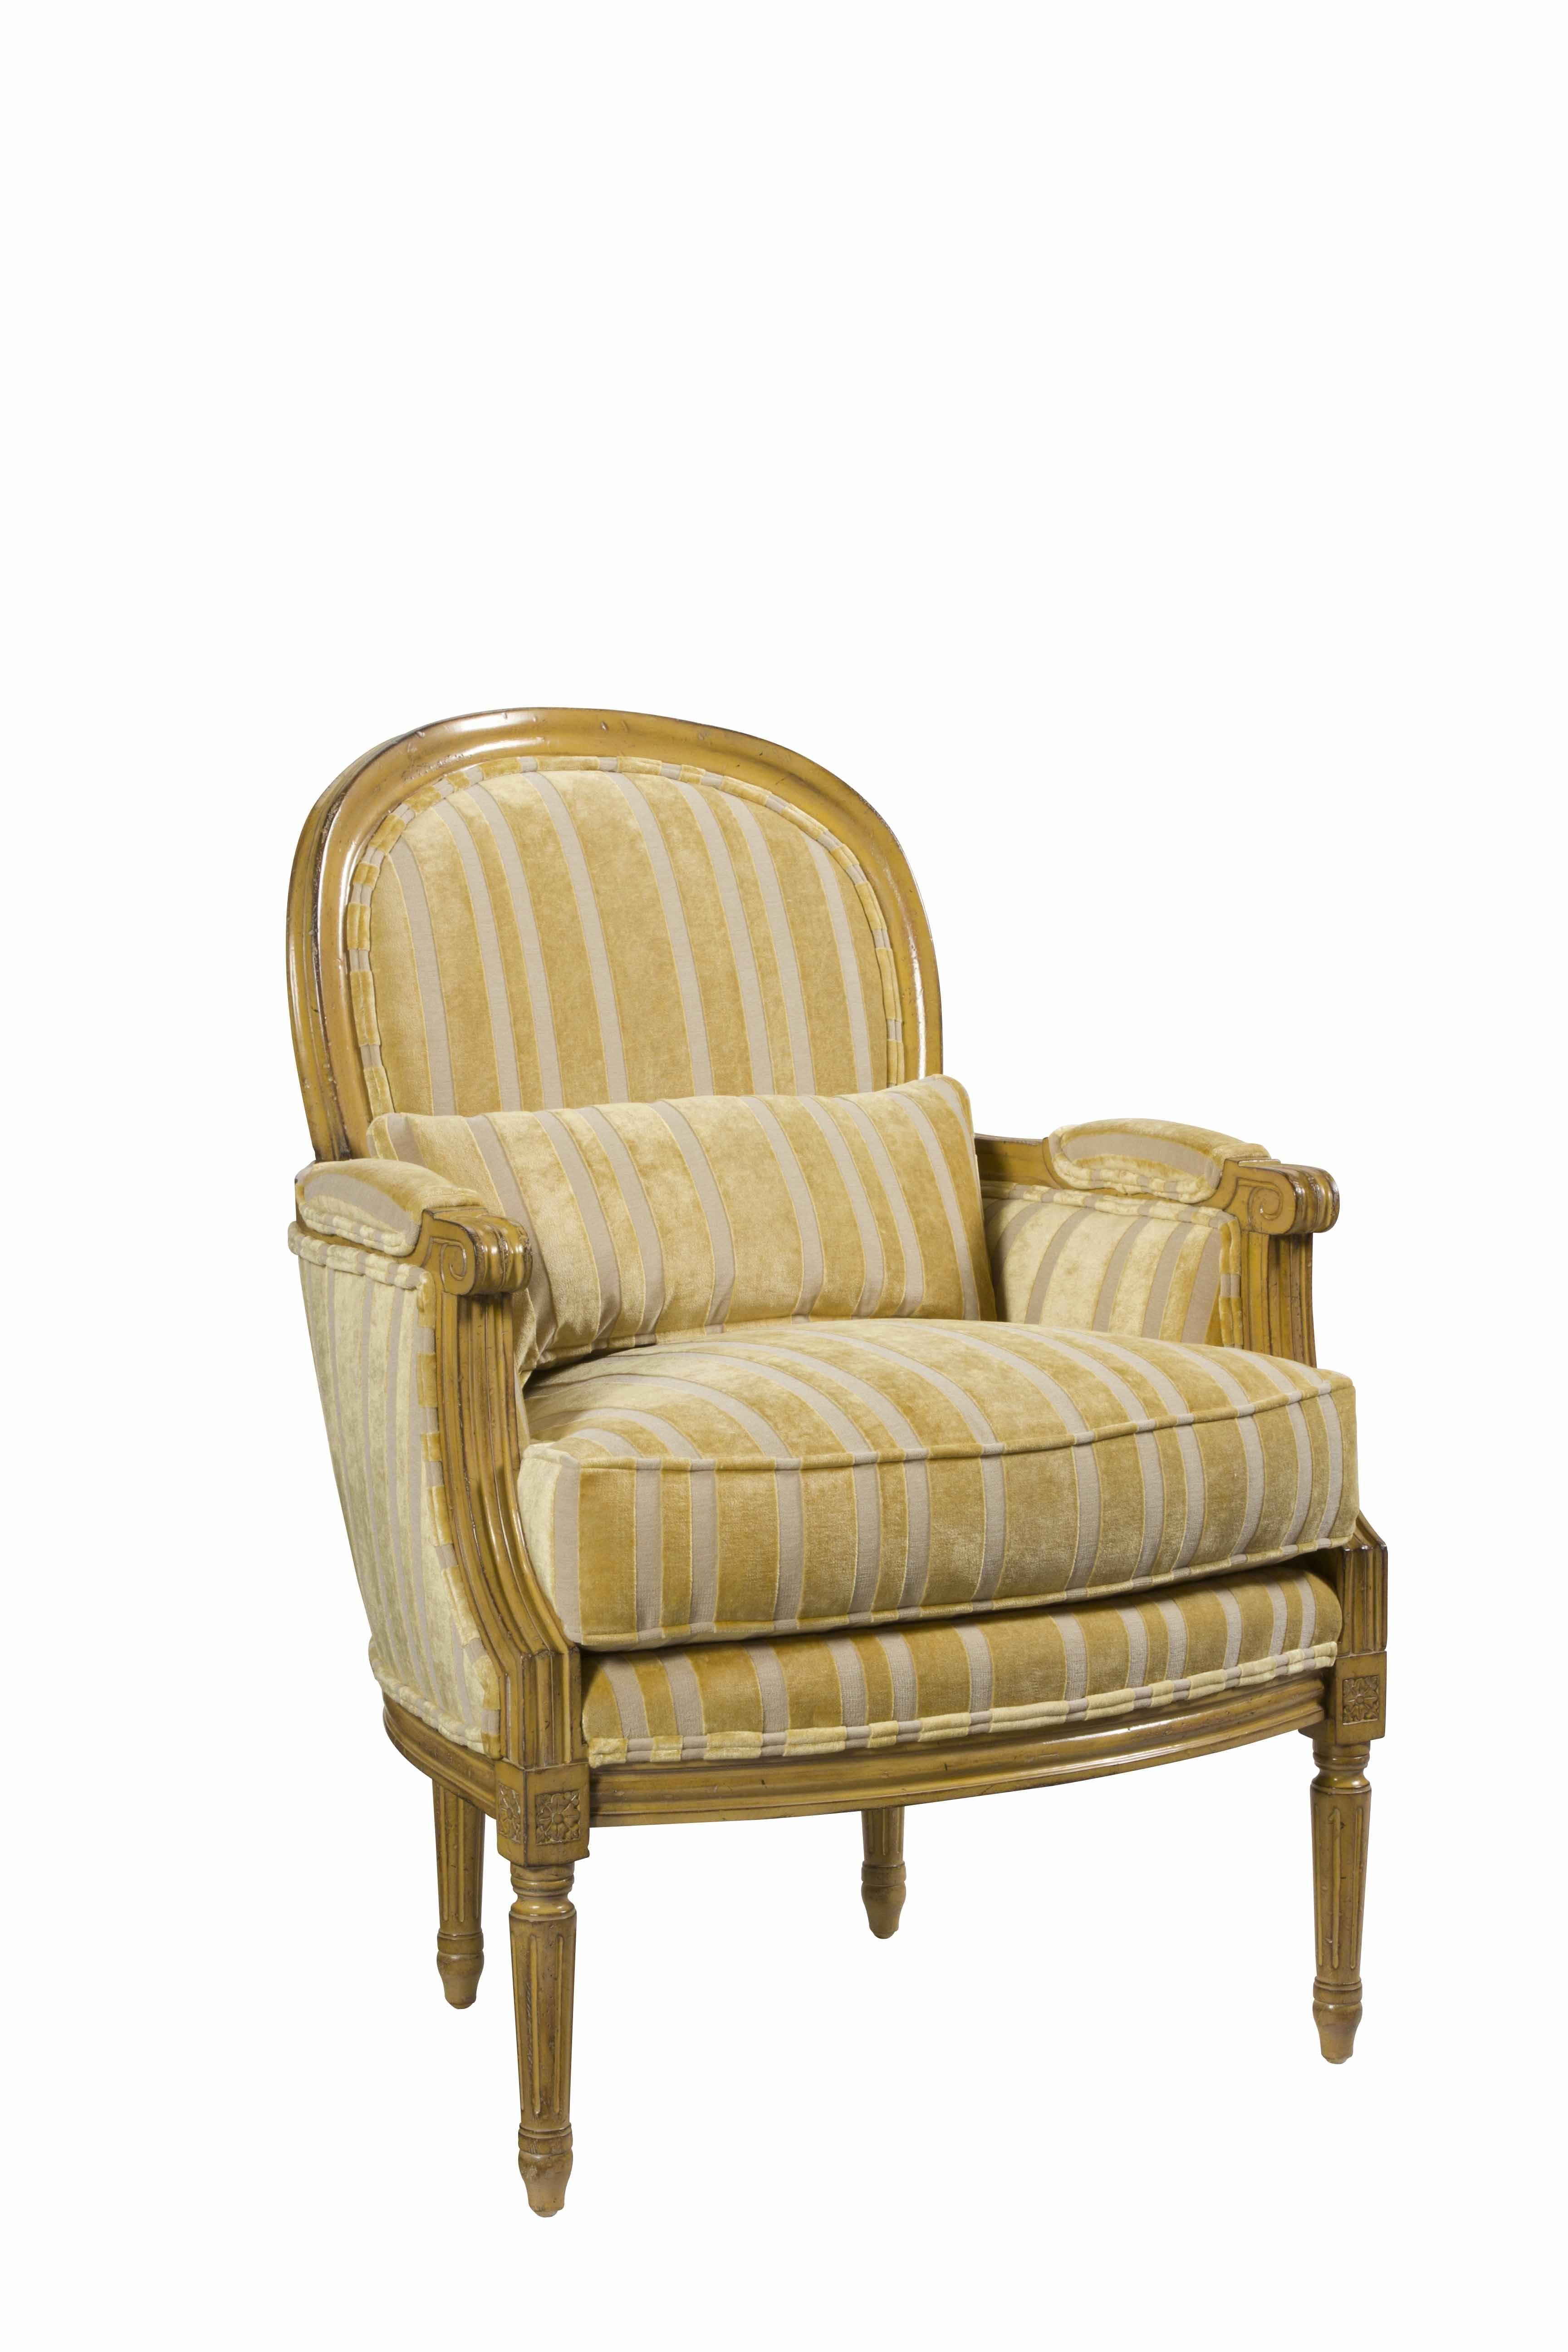 u 3076 0427 celine medallion back chair available at french heritage rh pinterest co uk